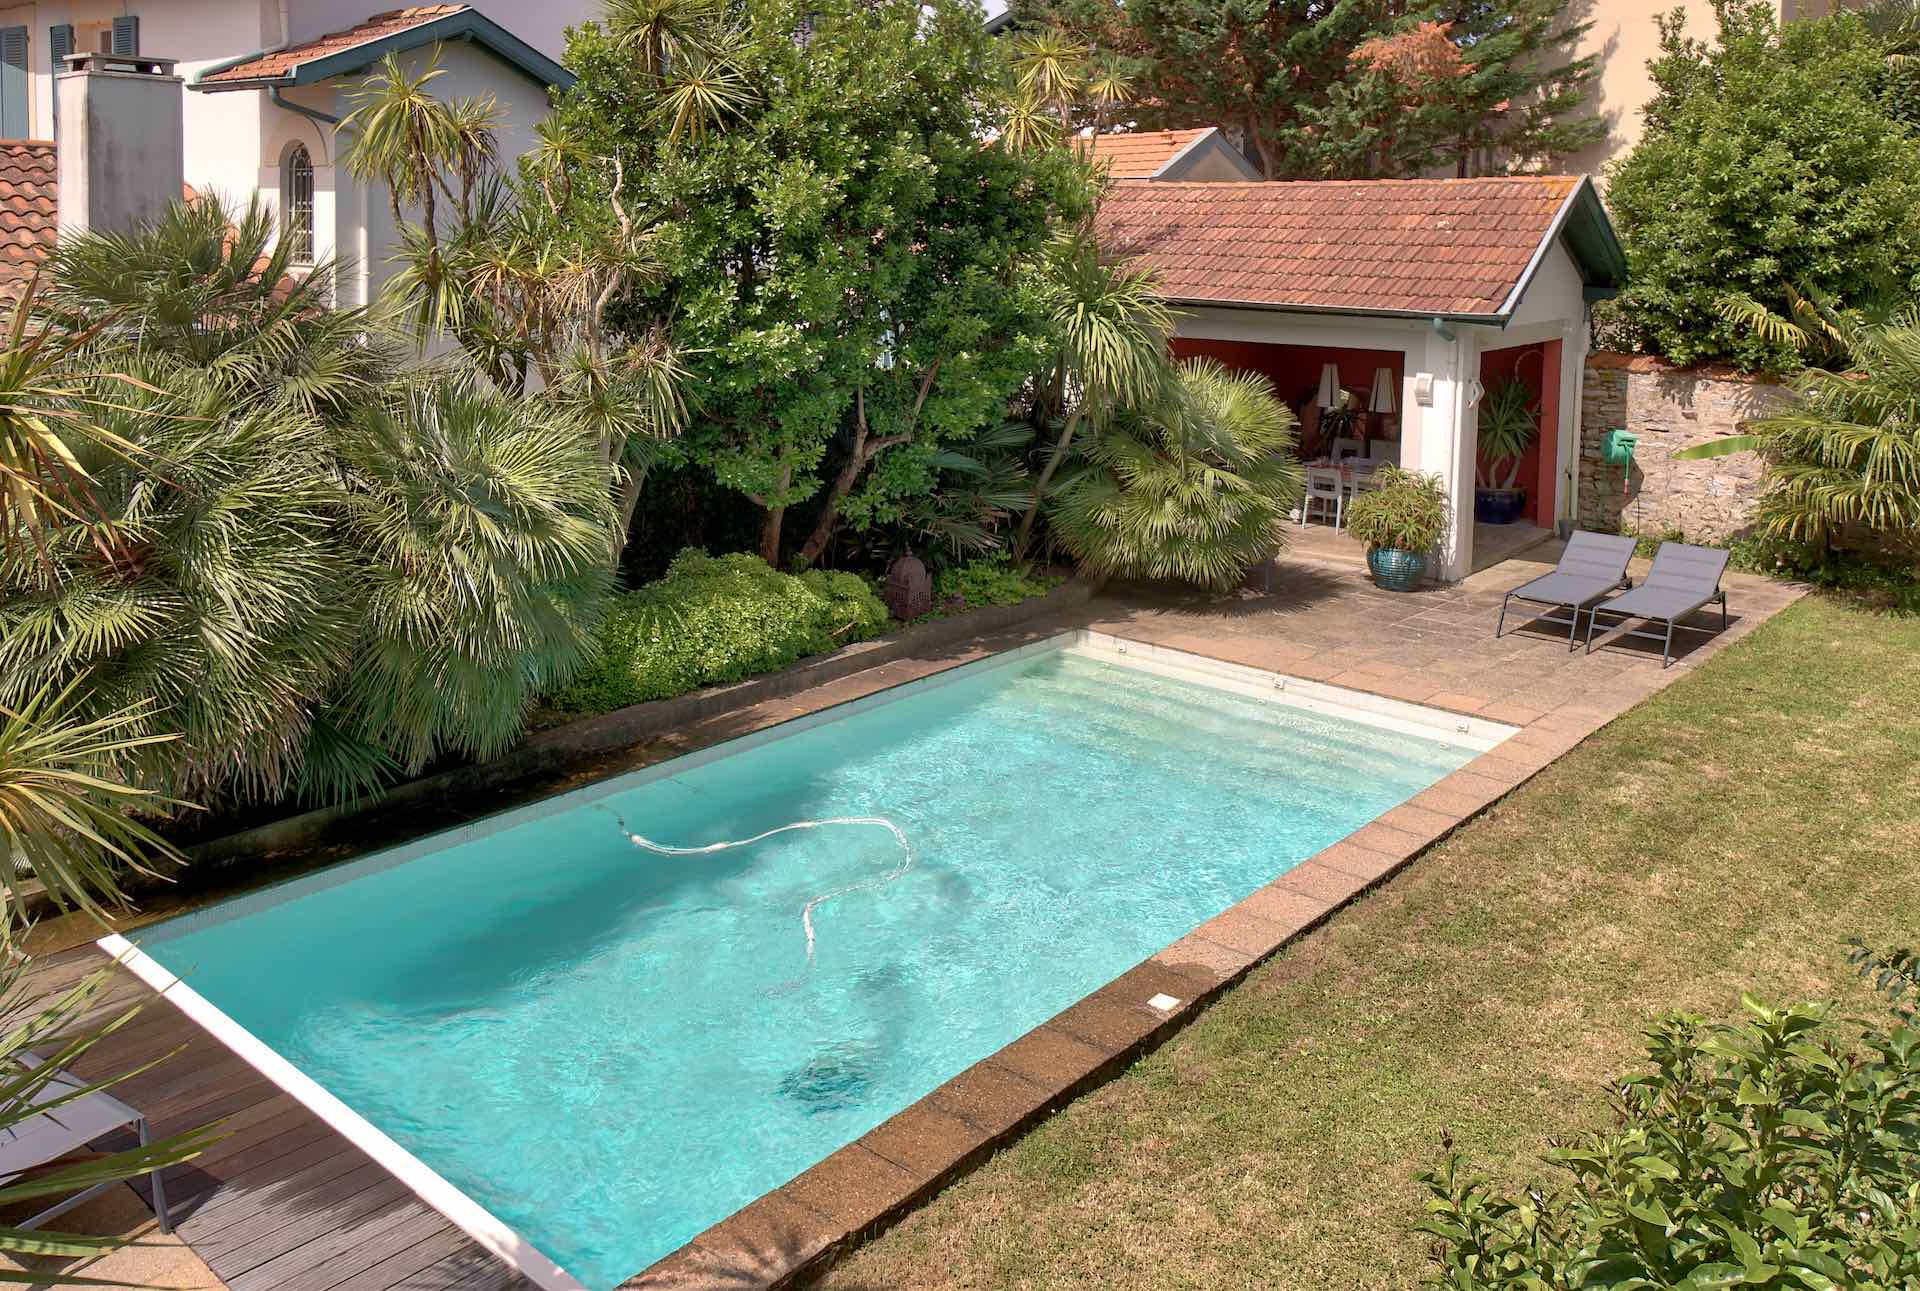 El gante villa ann es 30 en location biarritz piscine - Location maison sud ouest piscine ...